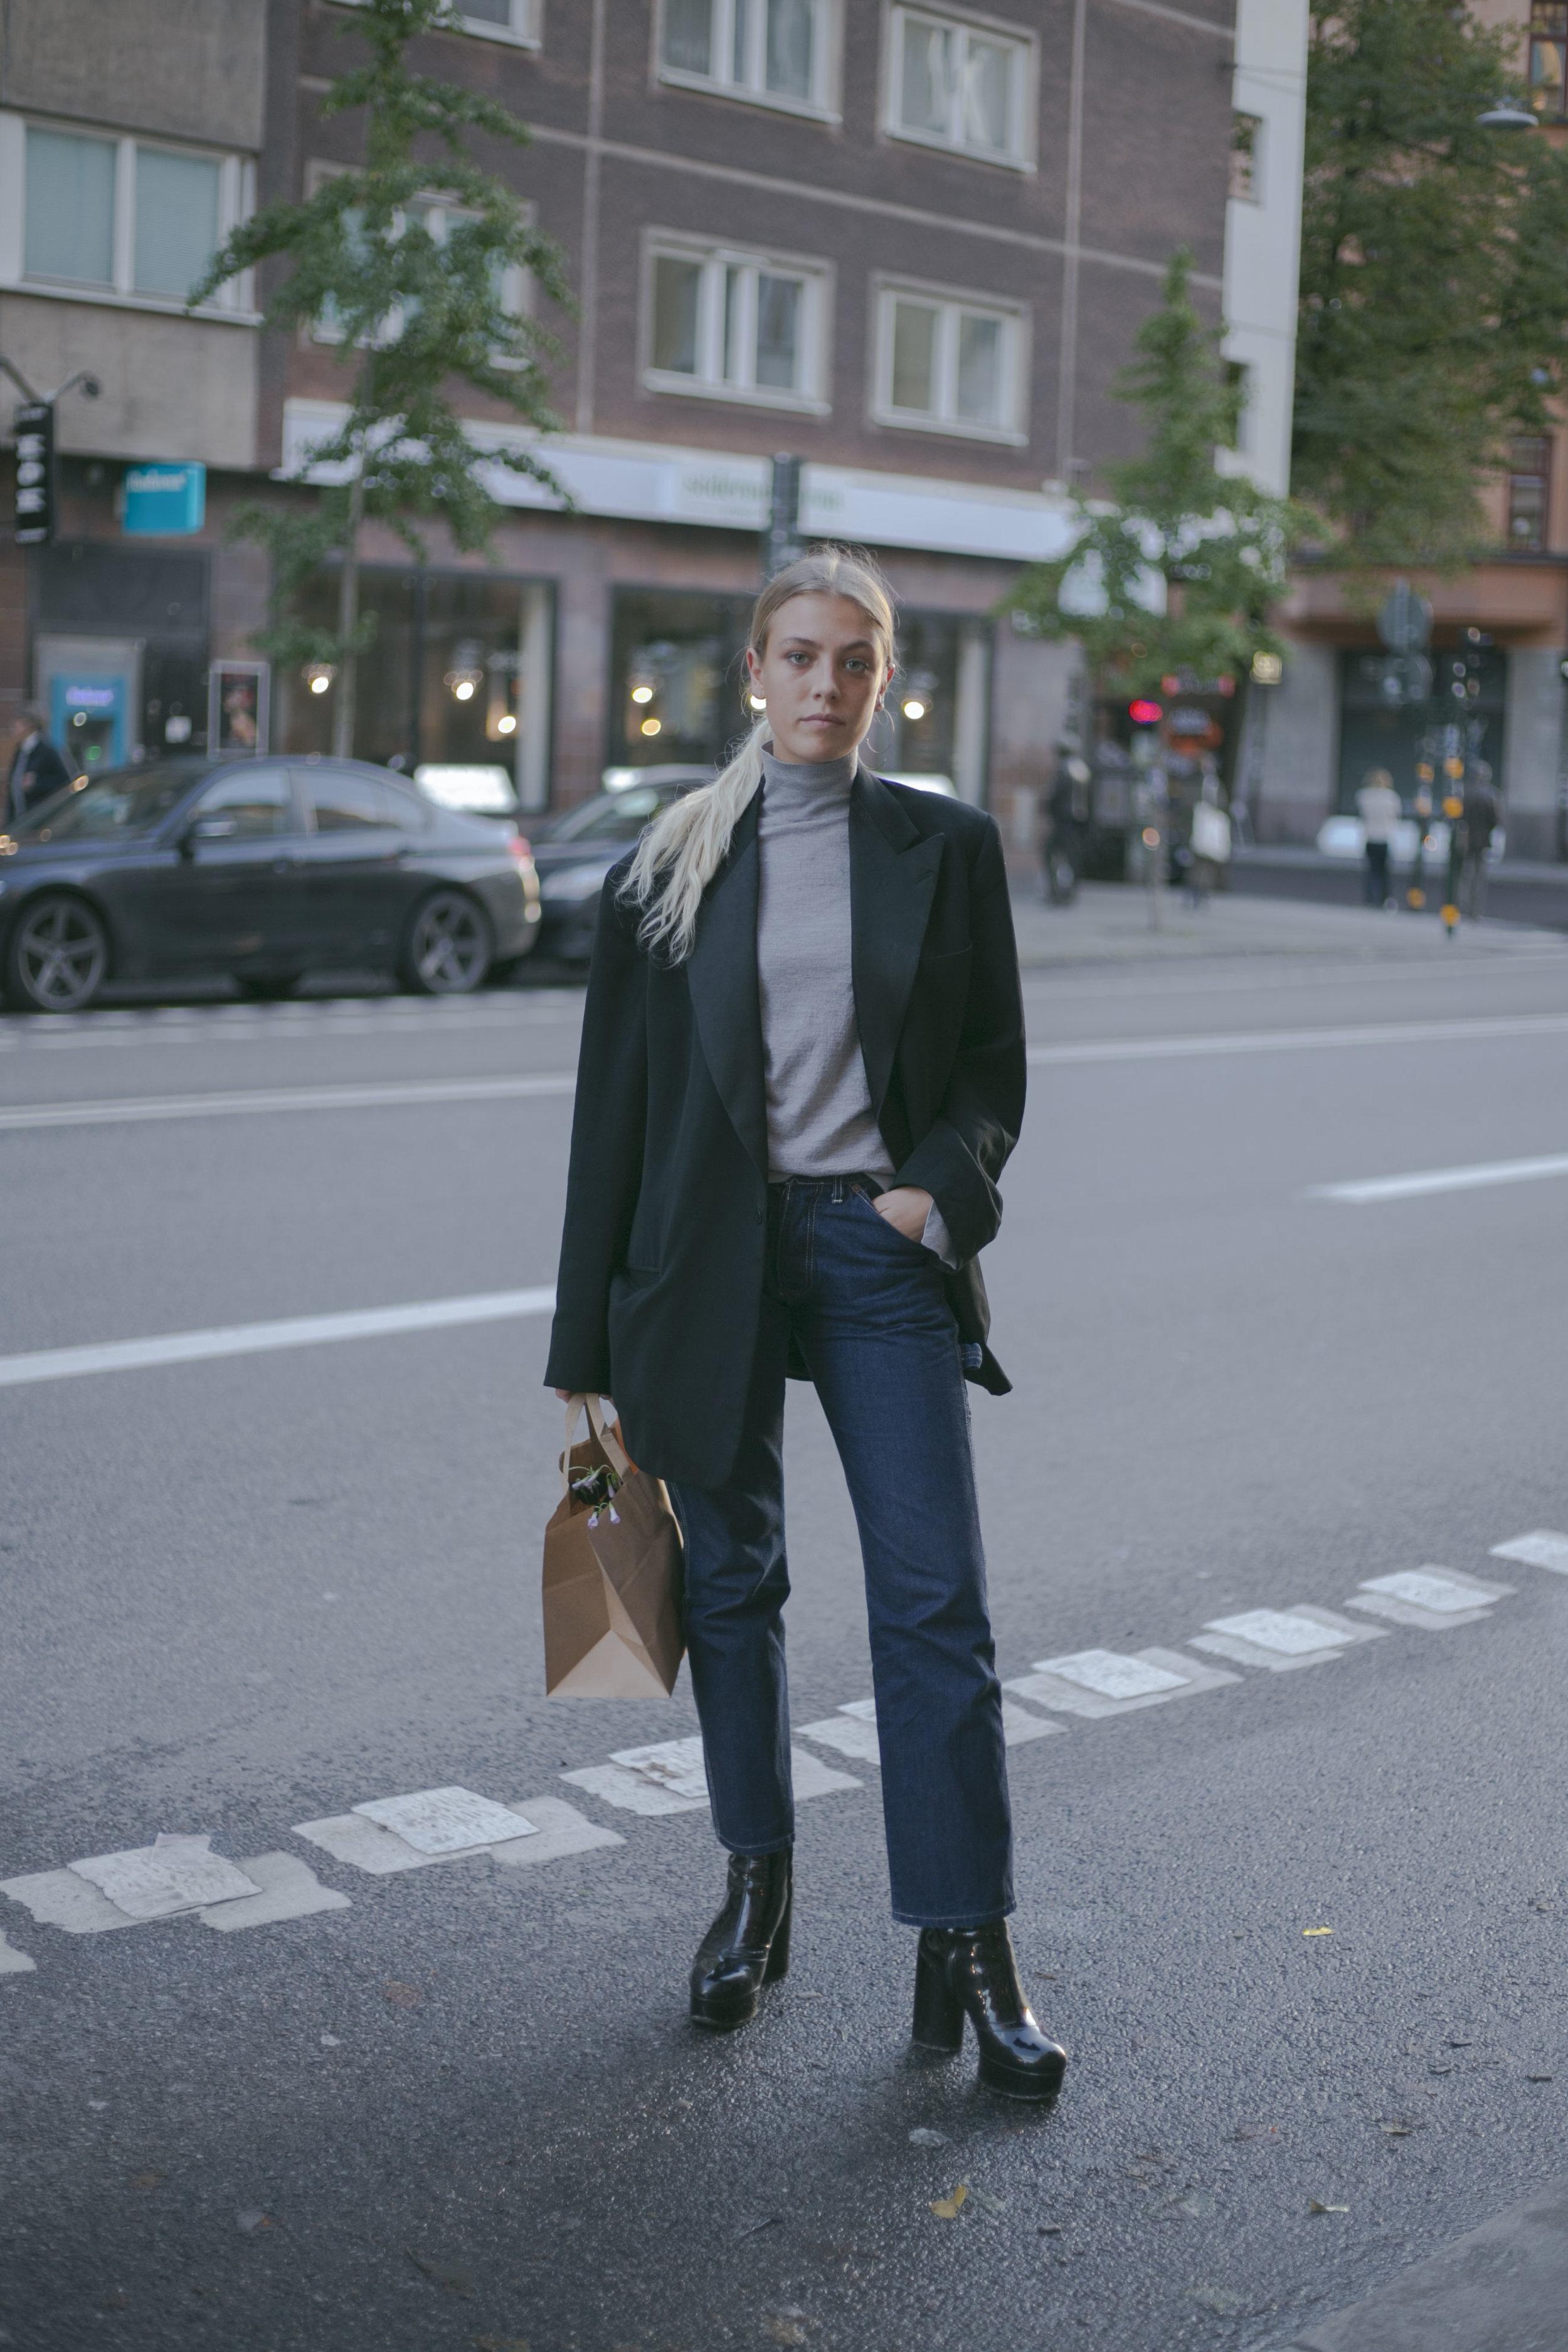 stockholm_streetstyle_thestreetland_streetland_bryndis_thorsteinsdottir_fashion_nordic_citystye_mode.jpg